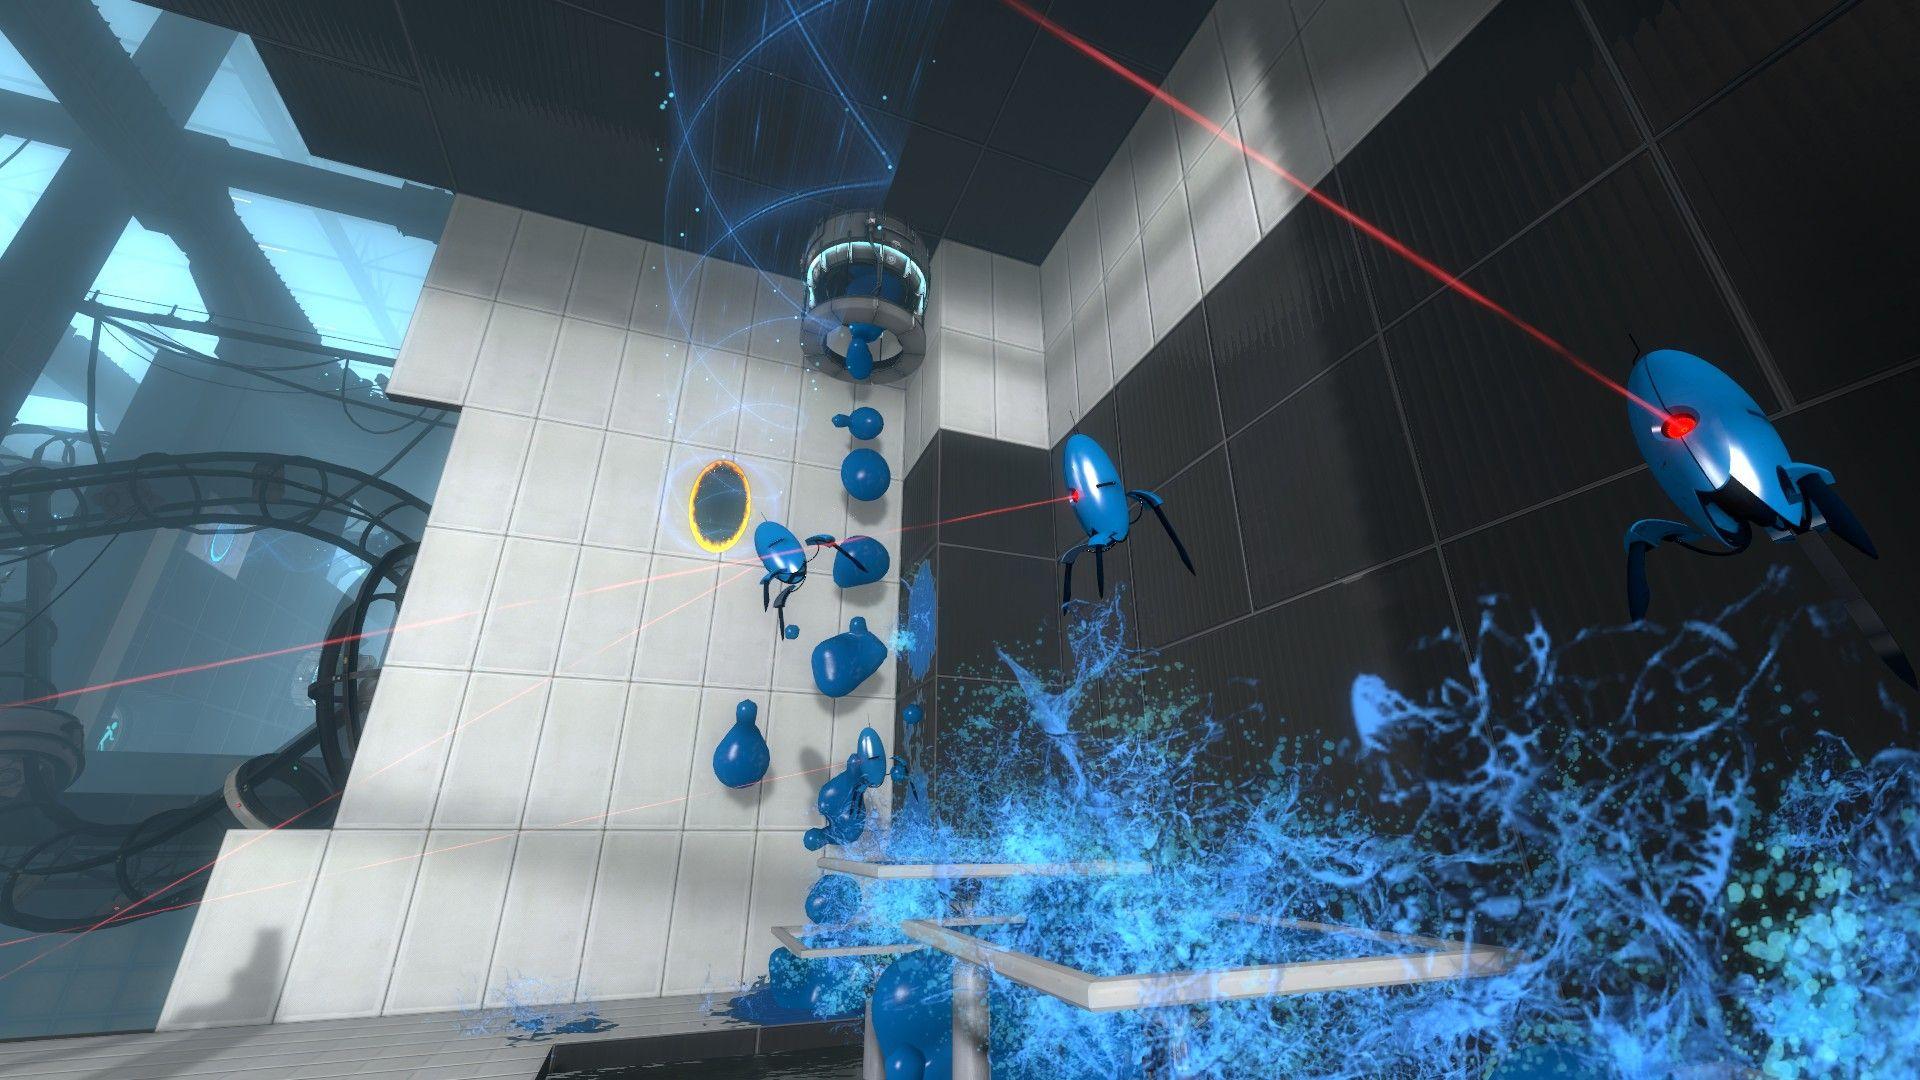 free steam games portal 2